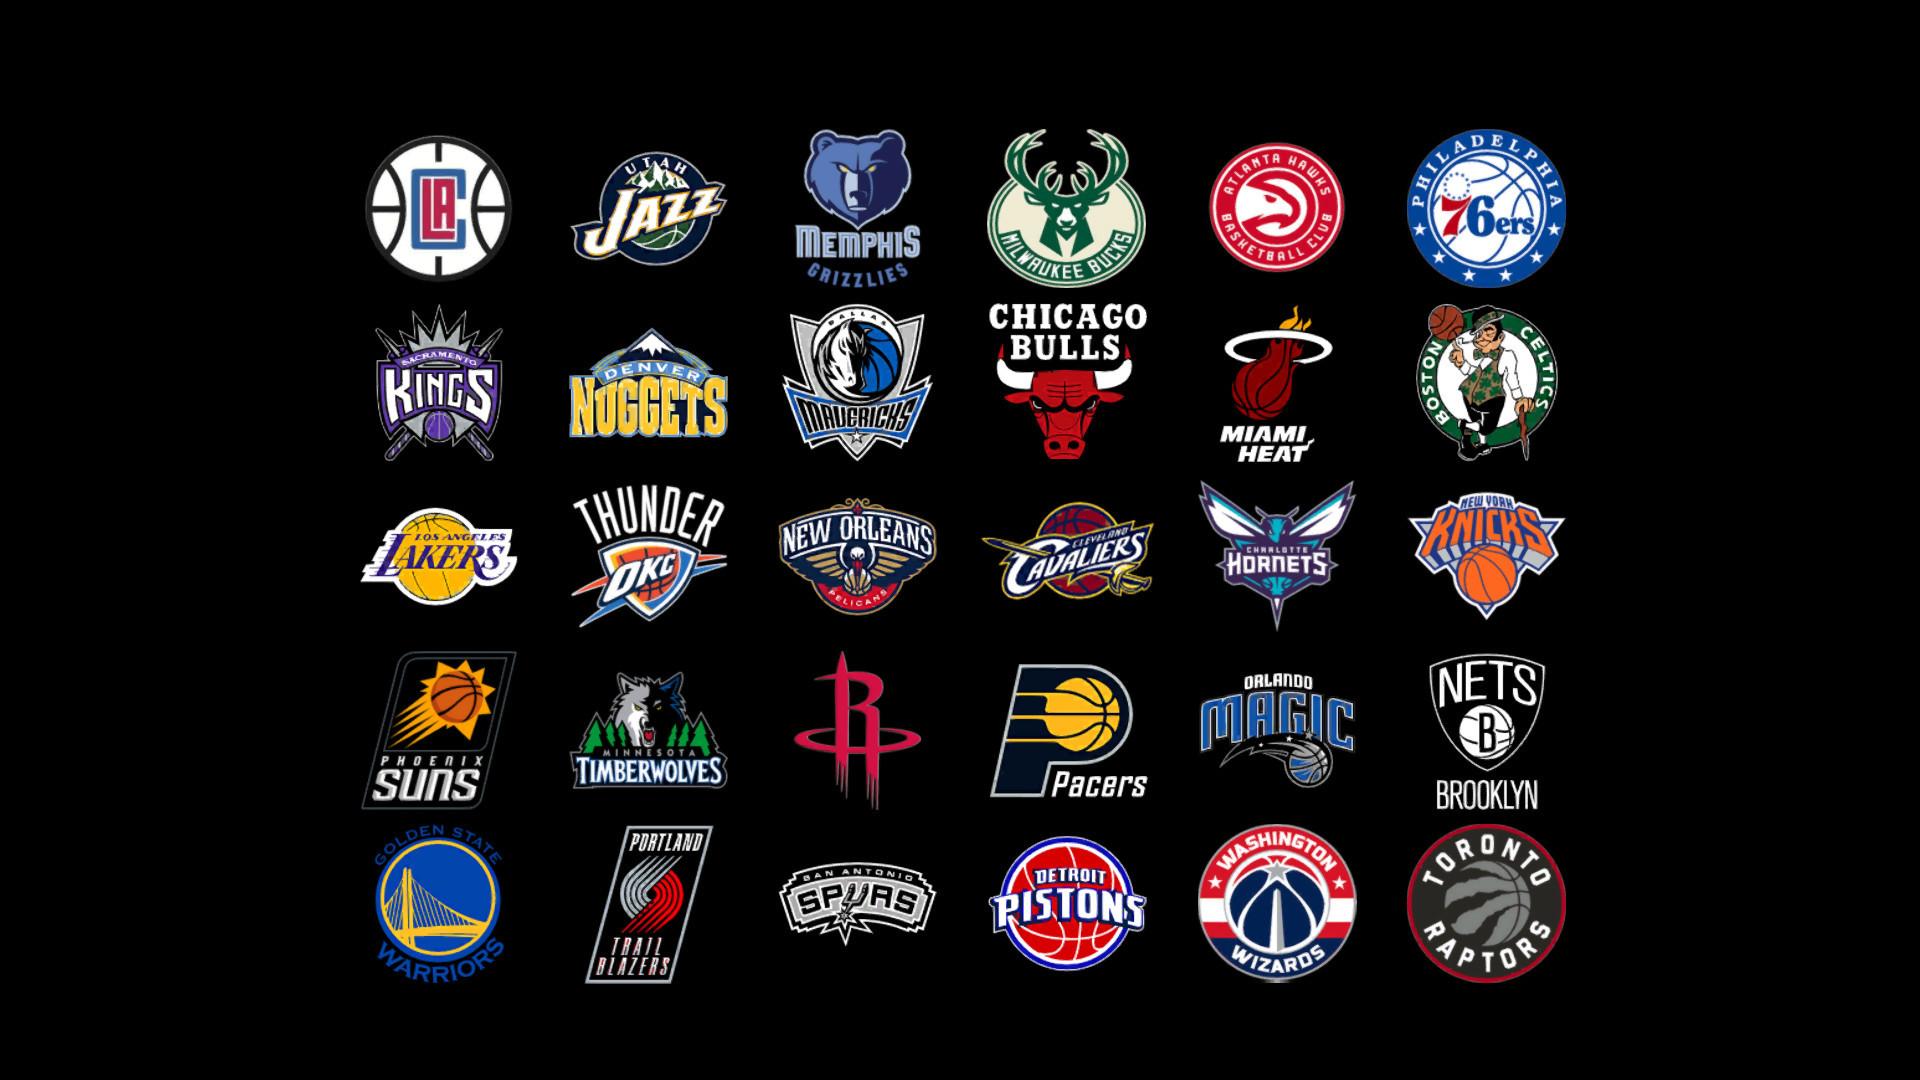 1920x1080 Los Angeles Lakers 2017 Nba Basketball Hardwood Logo Wallpaper Free Pc Desktop Computer Hd Download